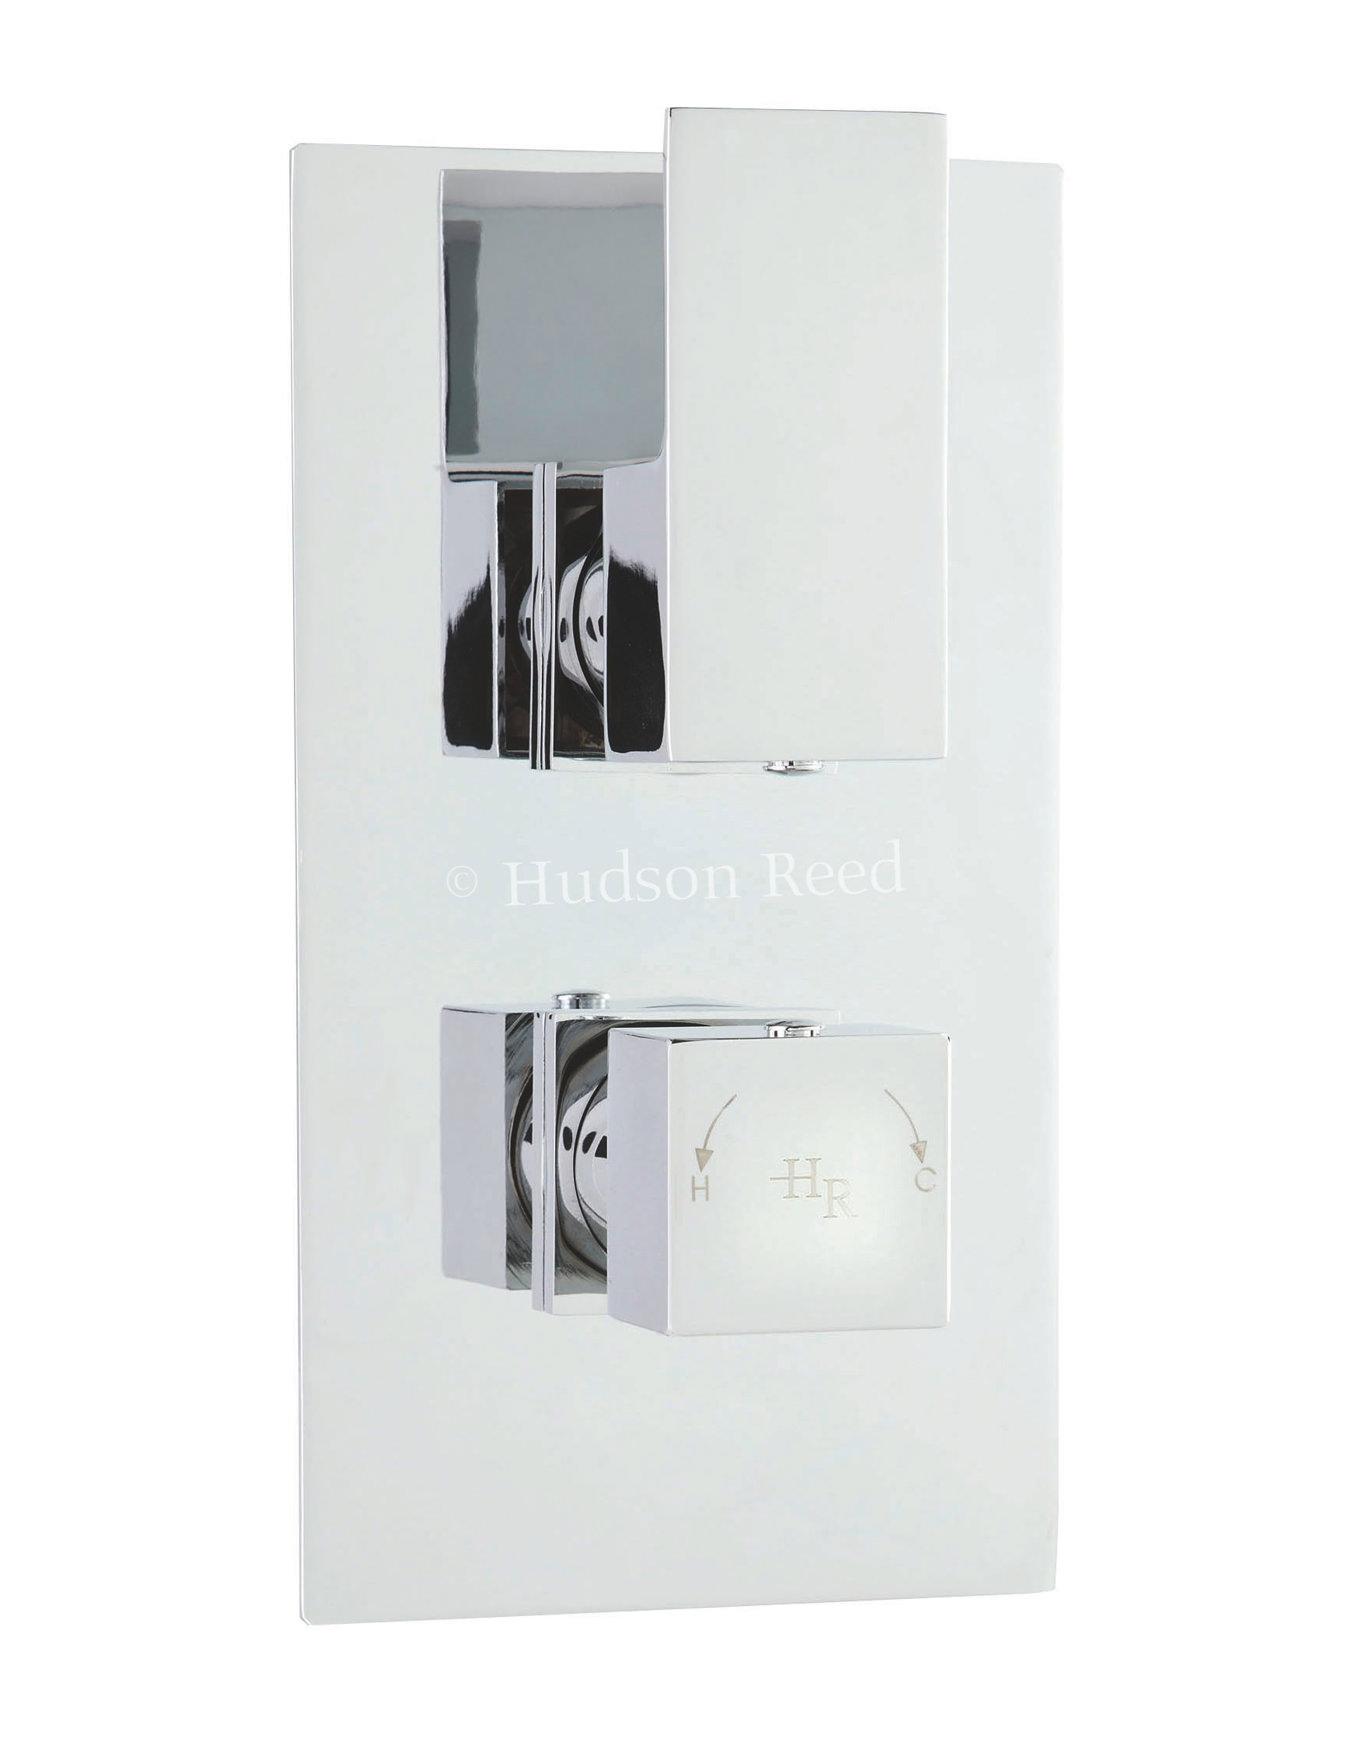 hudson reed art twin thermostatic shower valve with diverter. Black Bedroom Furniture Sets. Home Design Ideas